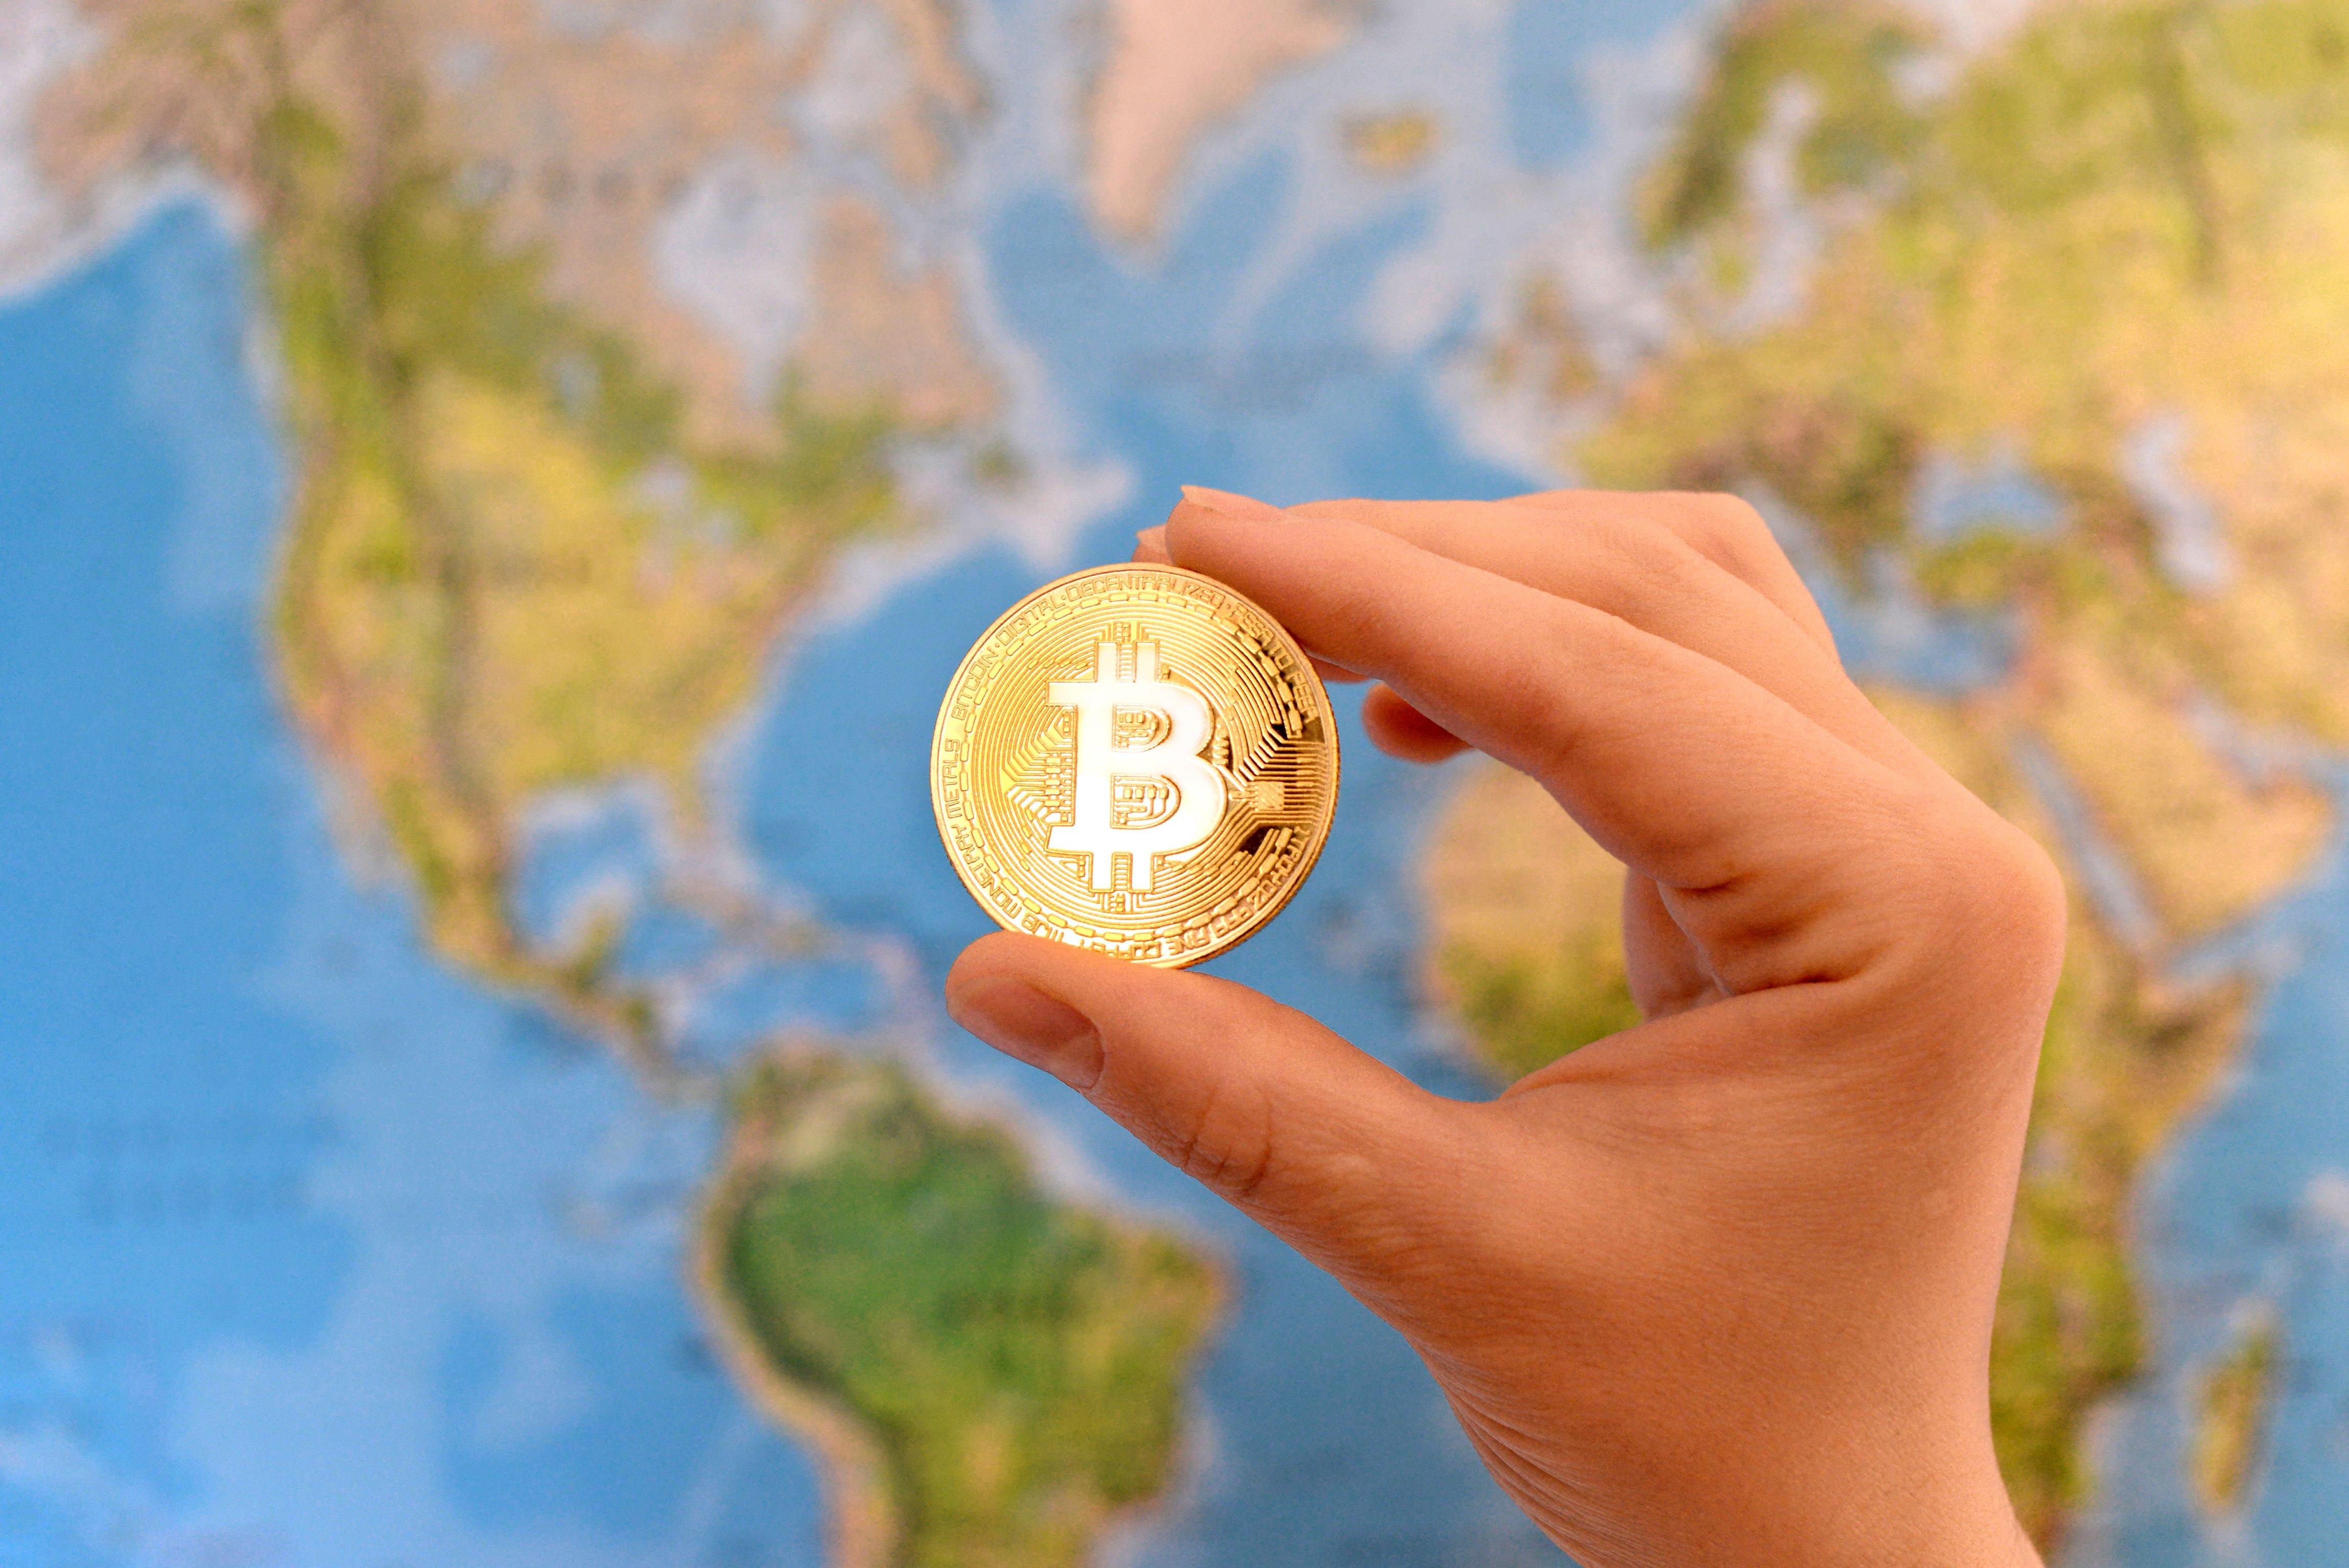 criptomonedas-mundo-economía-sistema monetario-internacional-criptomonedas